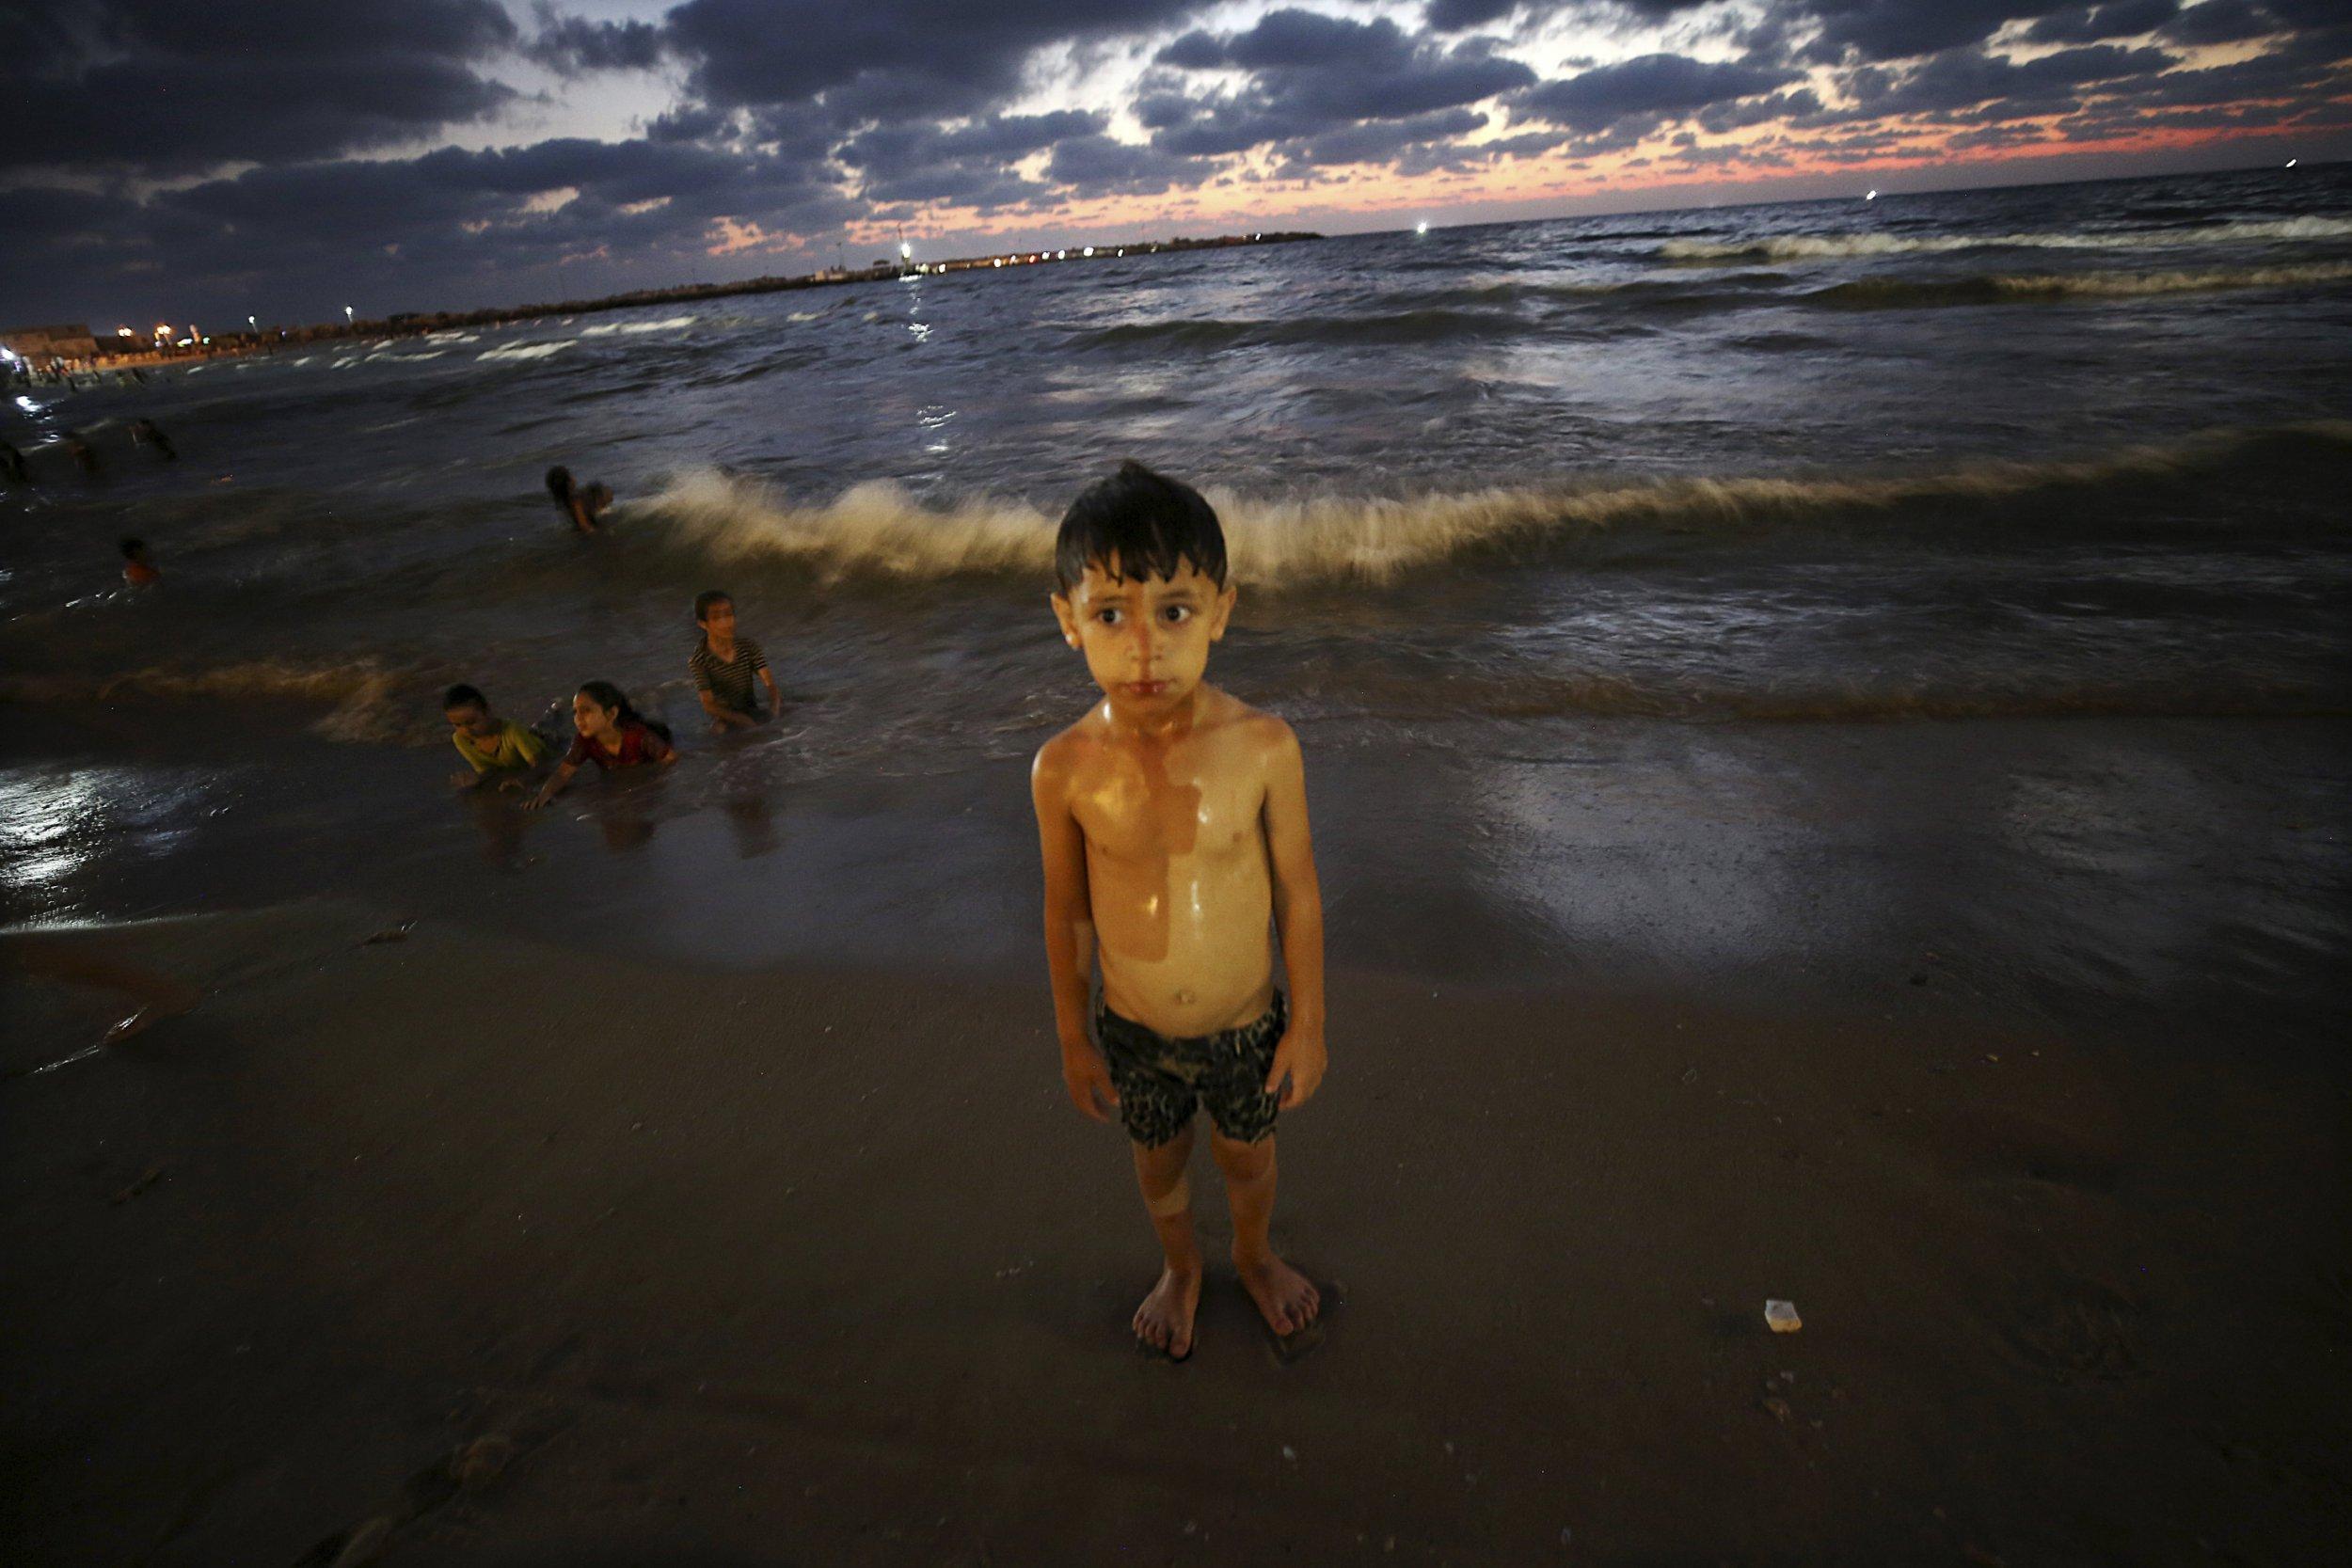 Palestinian children play in raw sewage on Gaza City's beaches